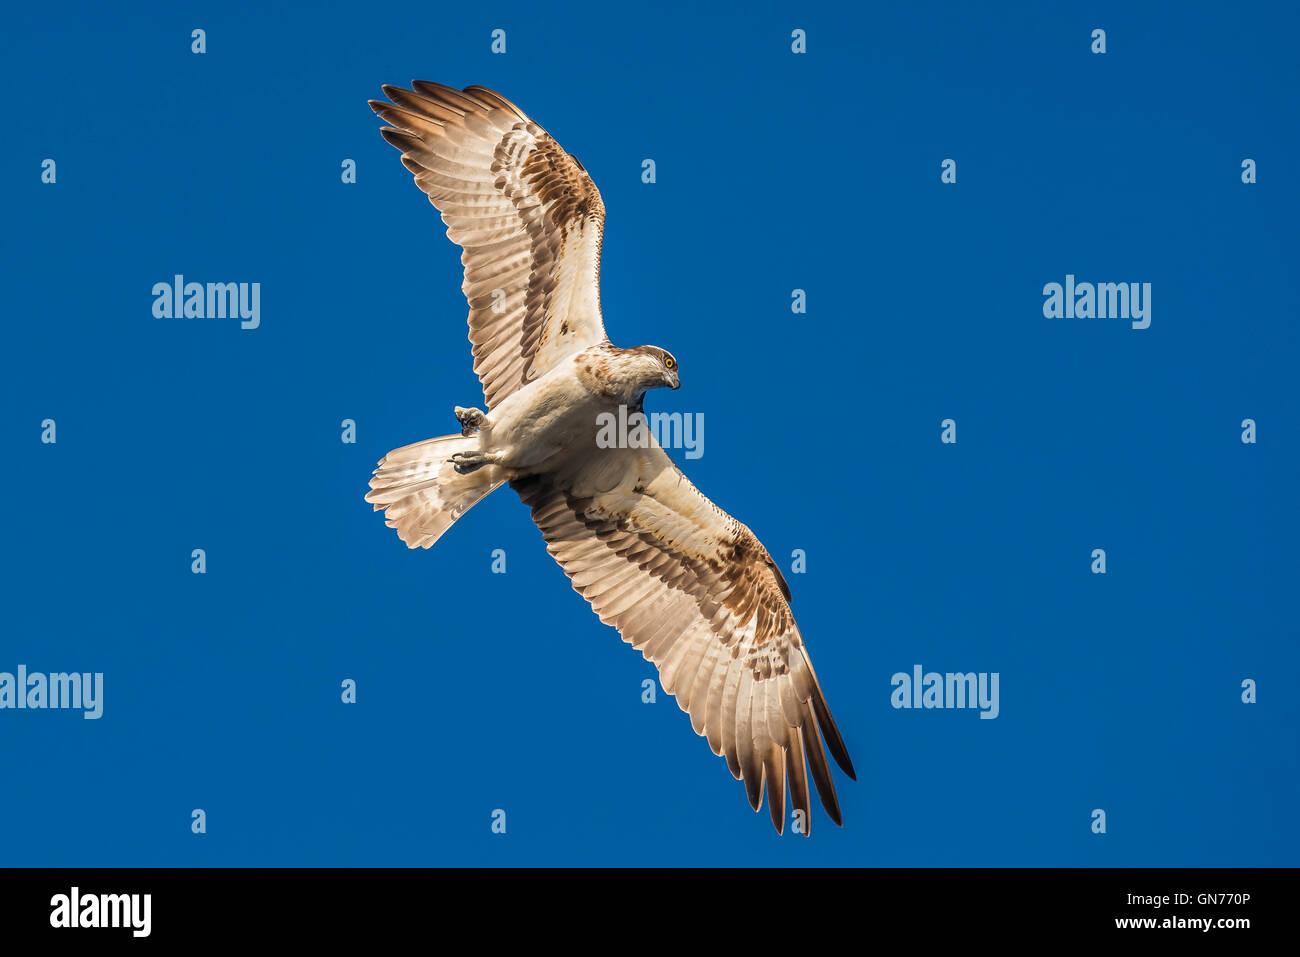 Osprey flying seeking for food - Stock Image